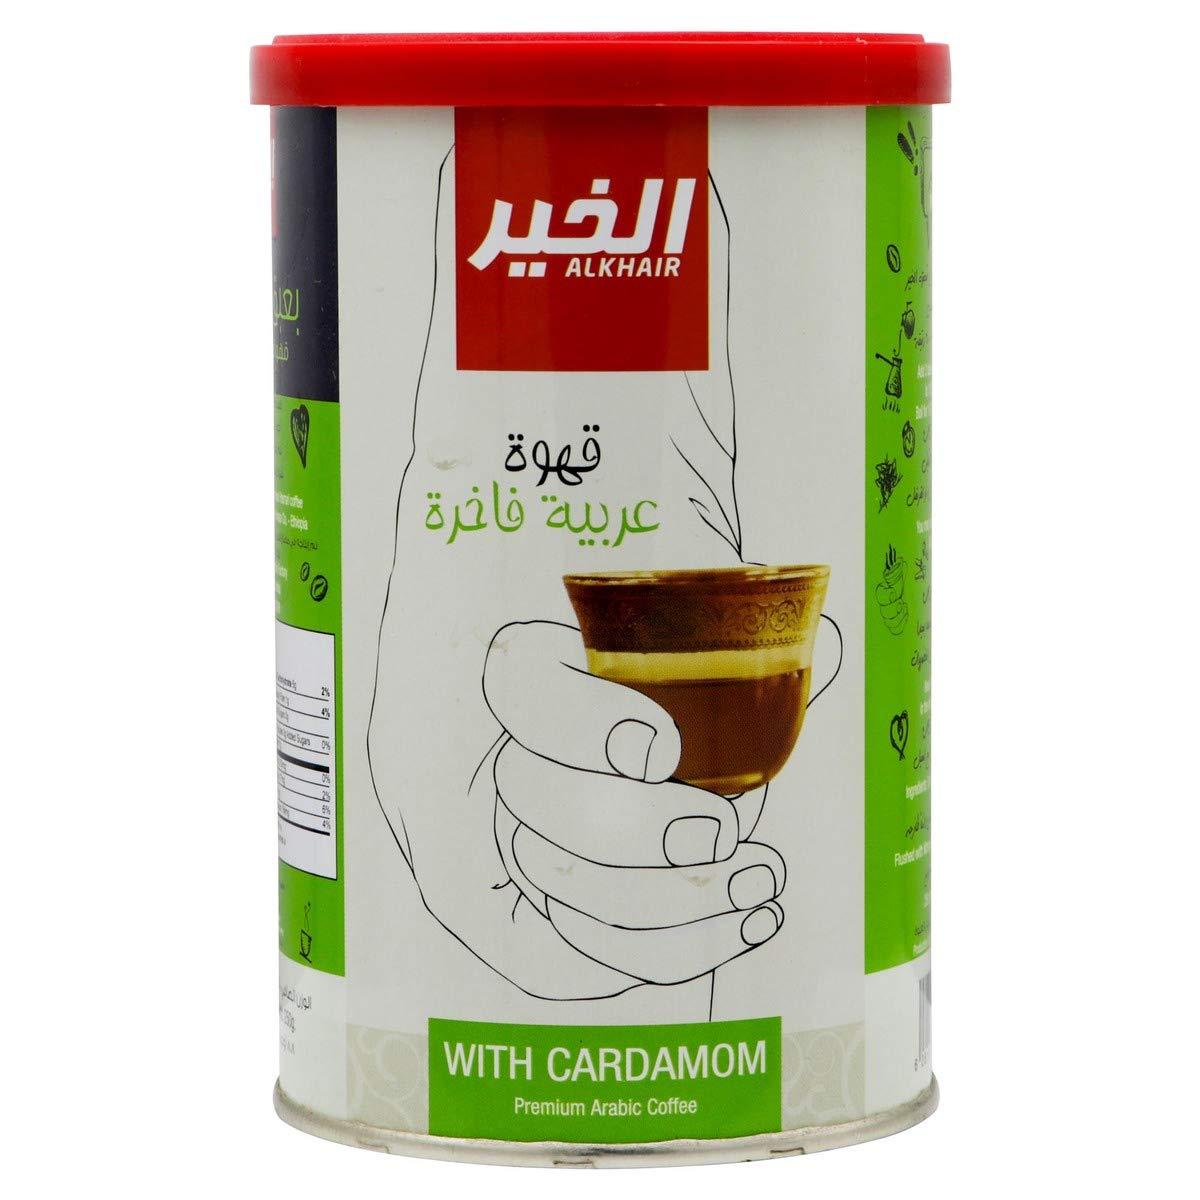 PREMIUM ARABIC COFFEE with cardamom 250 gram